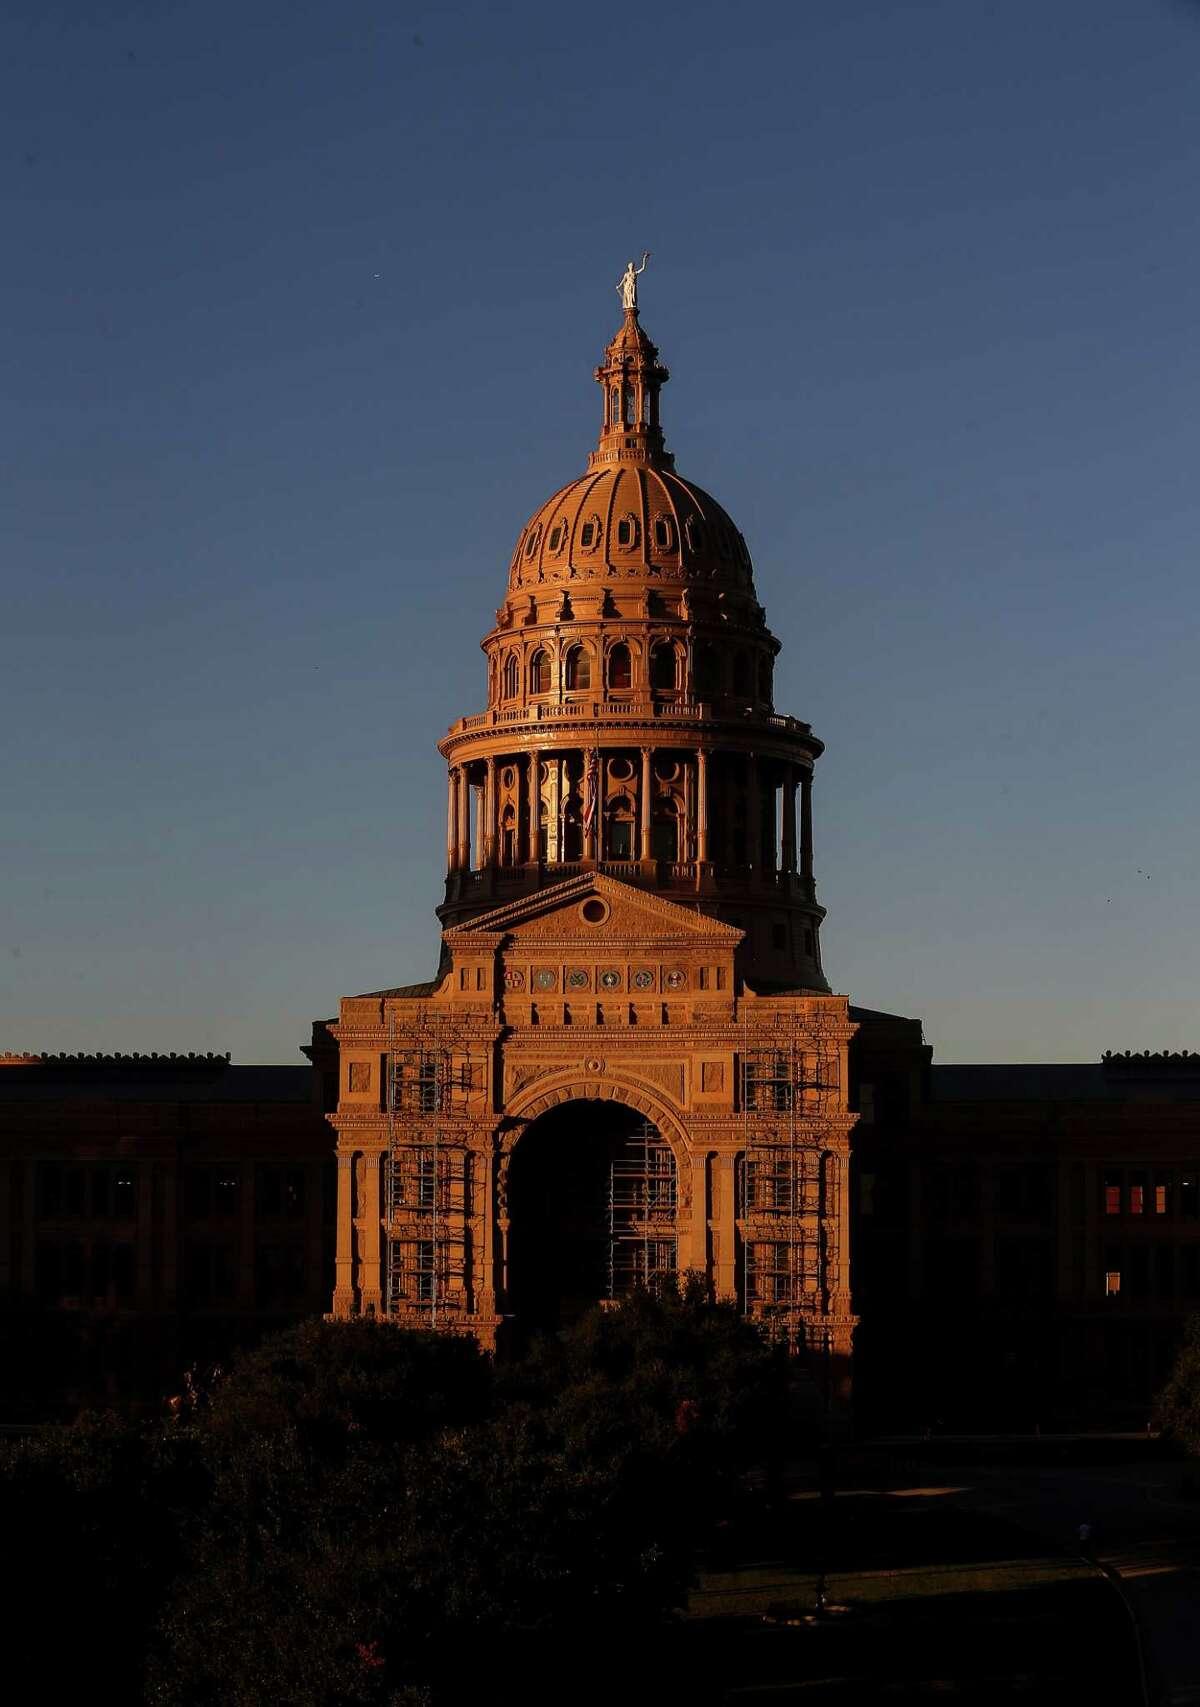 The sun sets over the Texas Capitol Friday, Oct. 21, 2016, in Austin. ( Jon Shapley / Houston Chronicle )